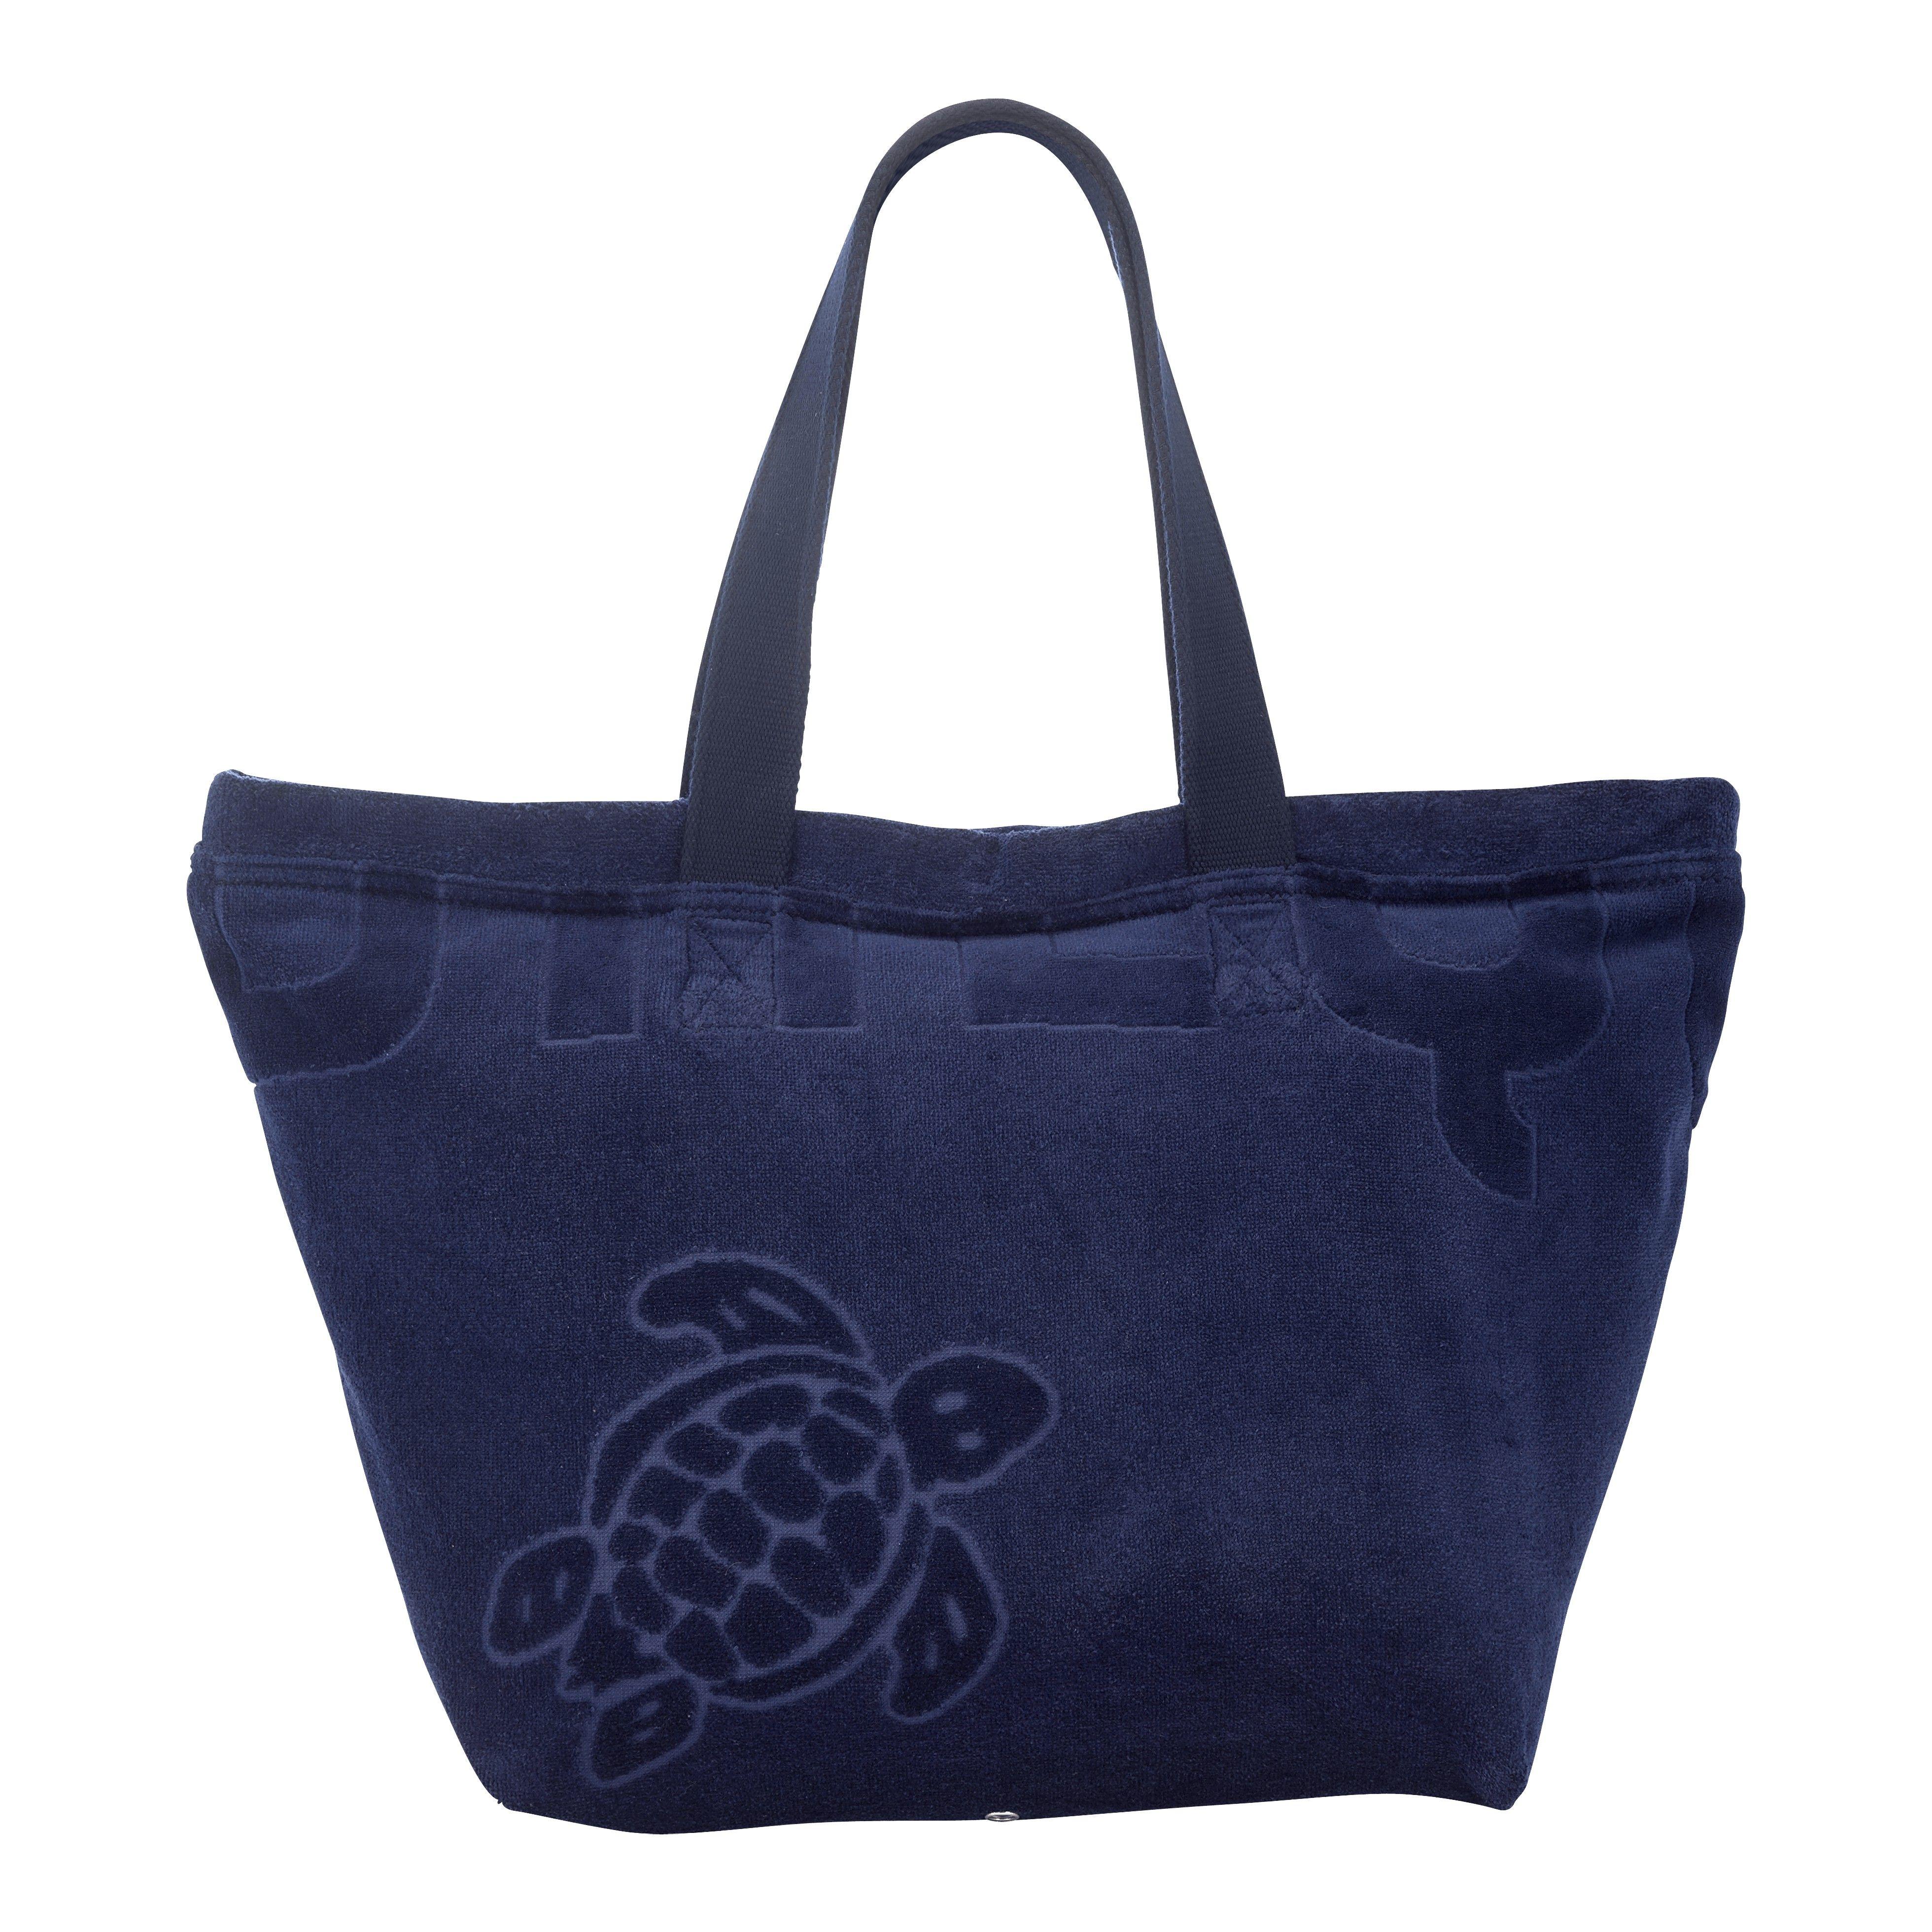 Terry Beach Bag VILEBREQUIN, Barney - Jacquard Uni Blue Vilebrequin